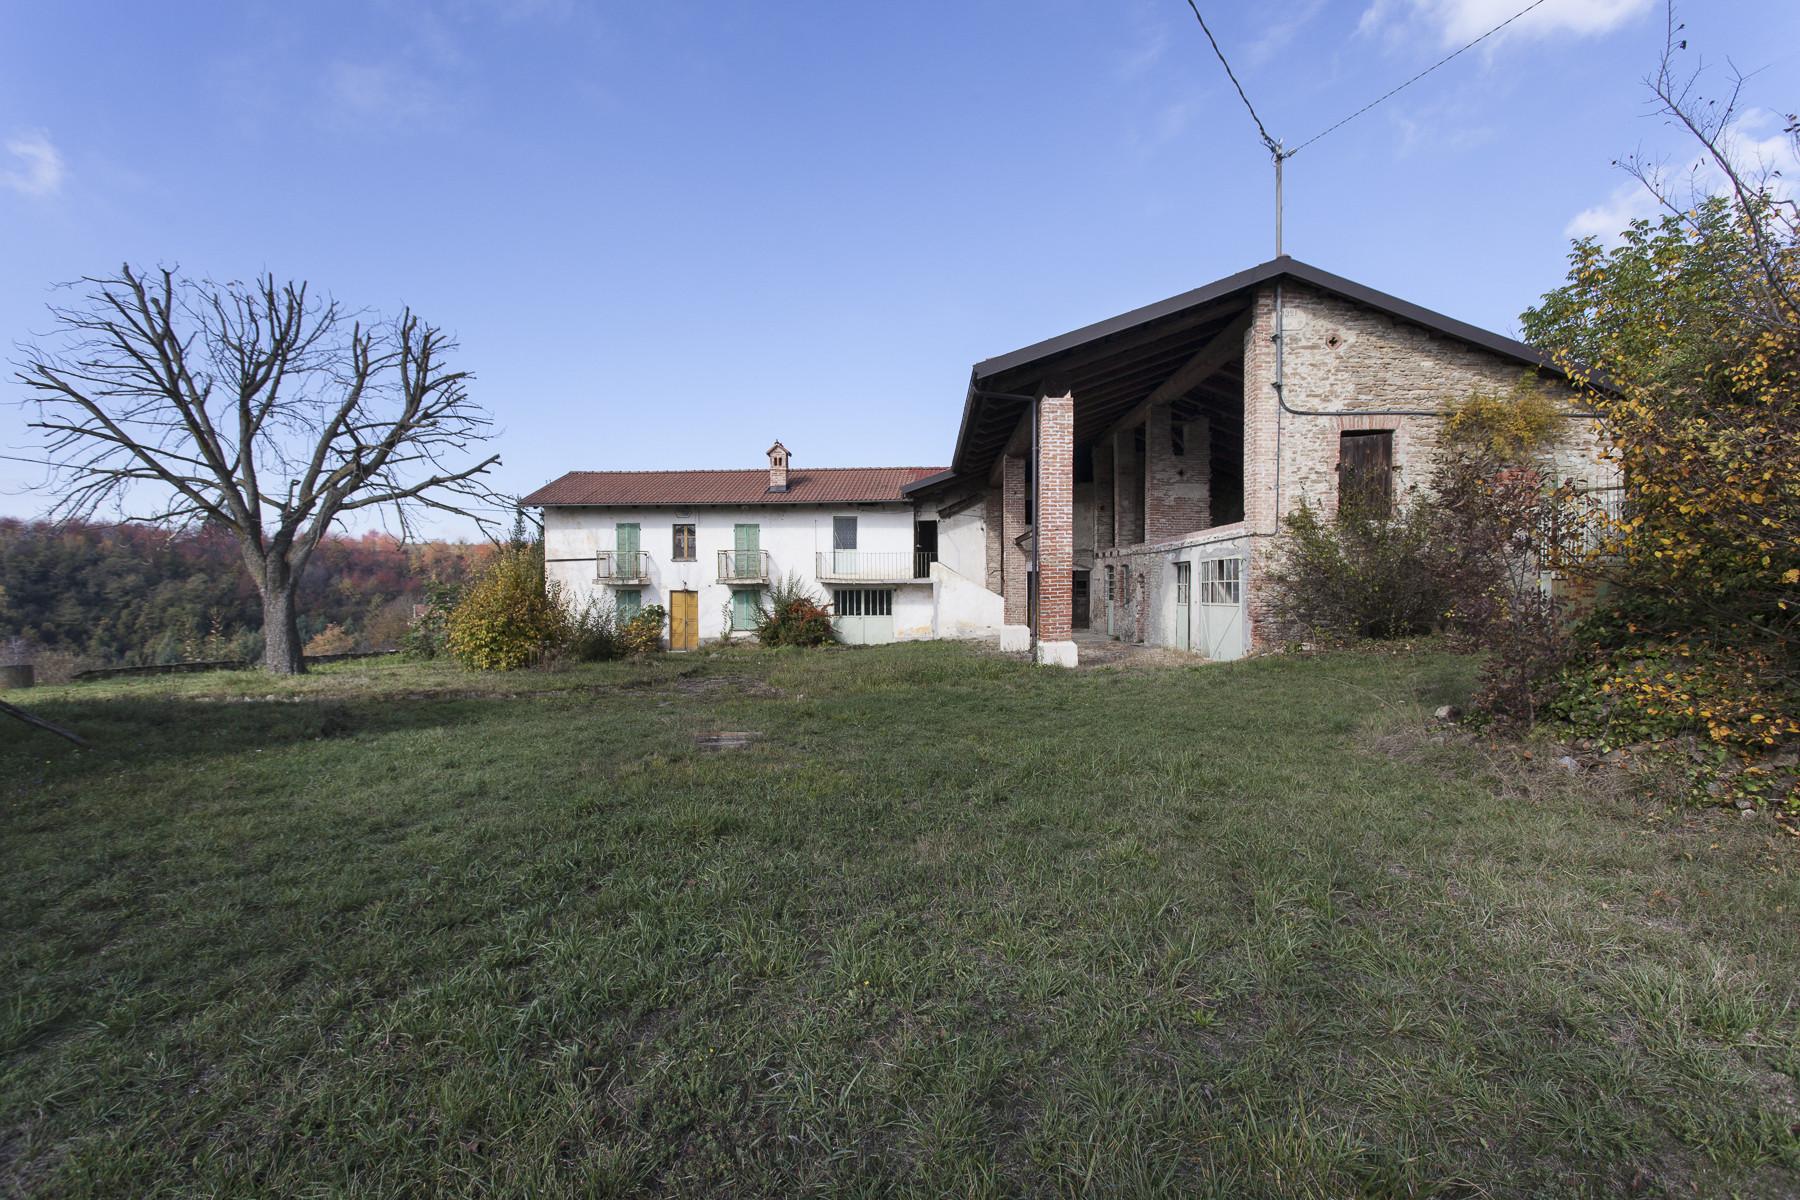 Villa in Vendita a Clavesana: 5 locali, 1130 mq - Foto 5